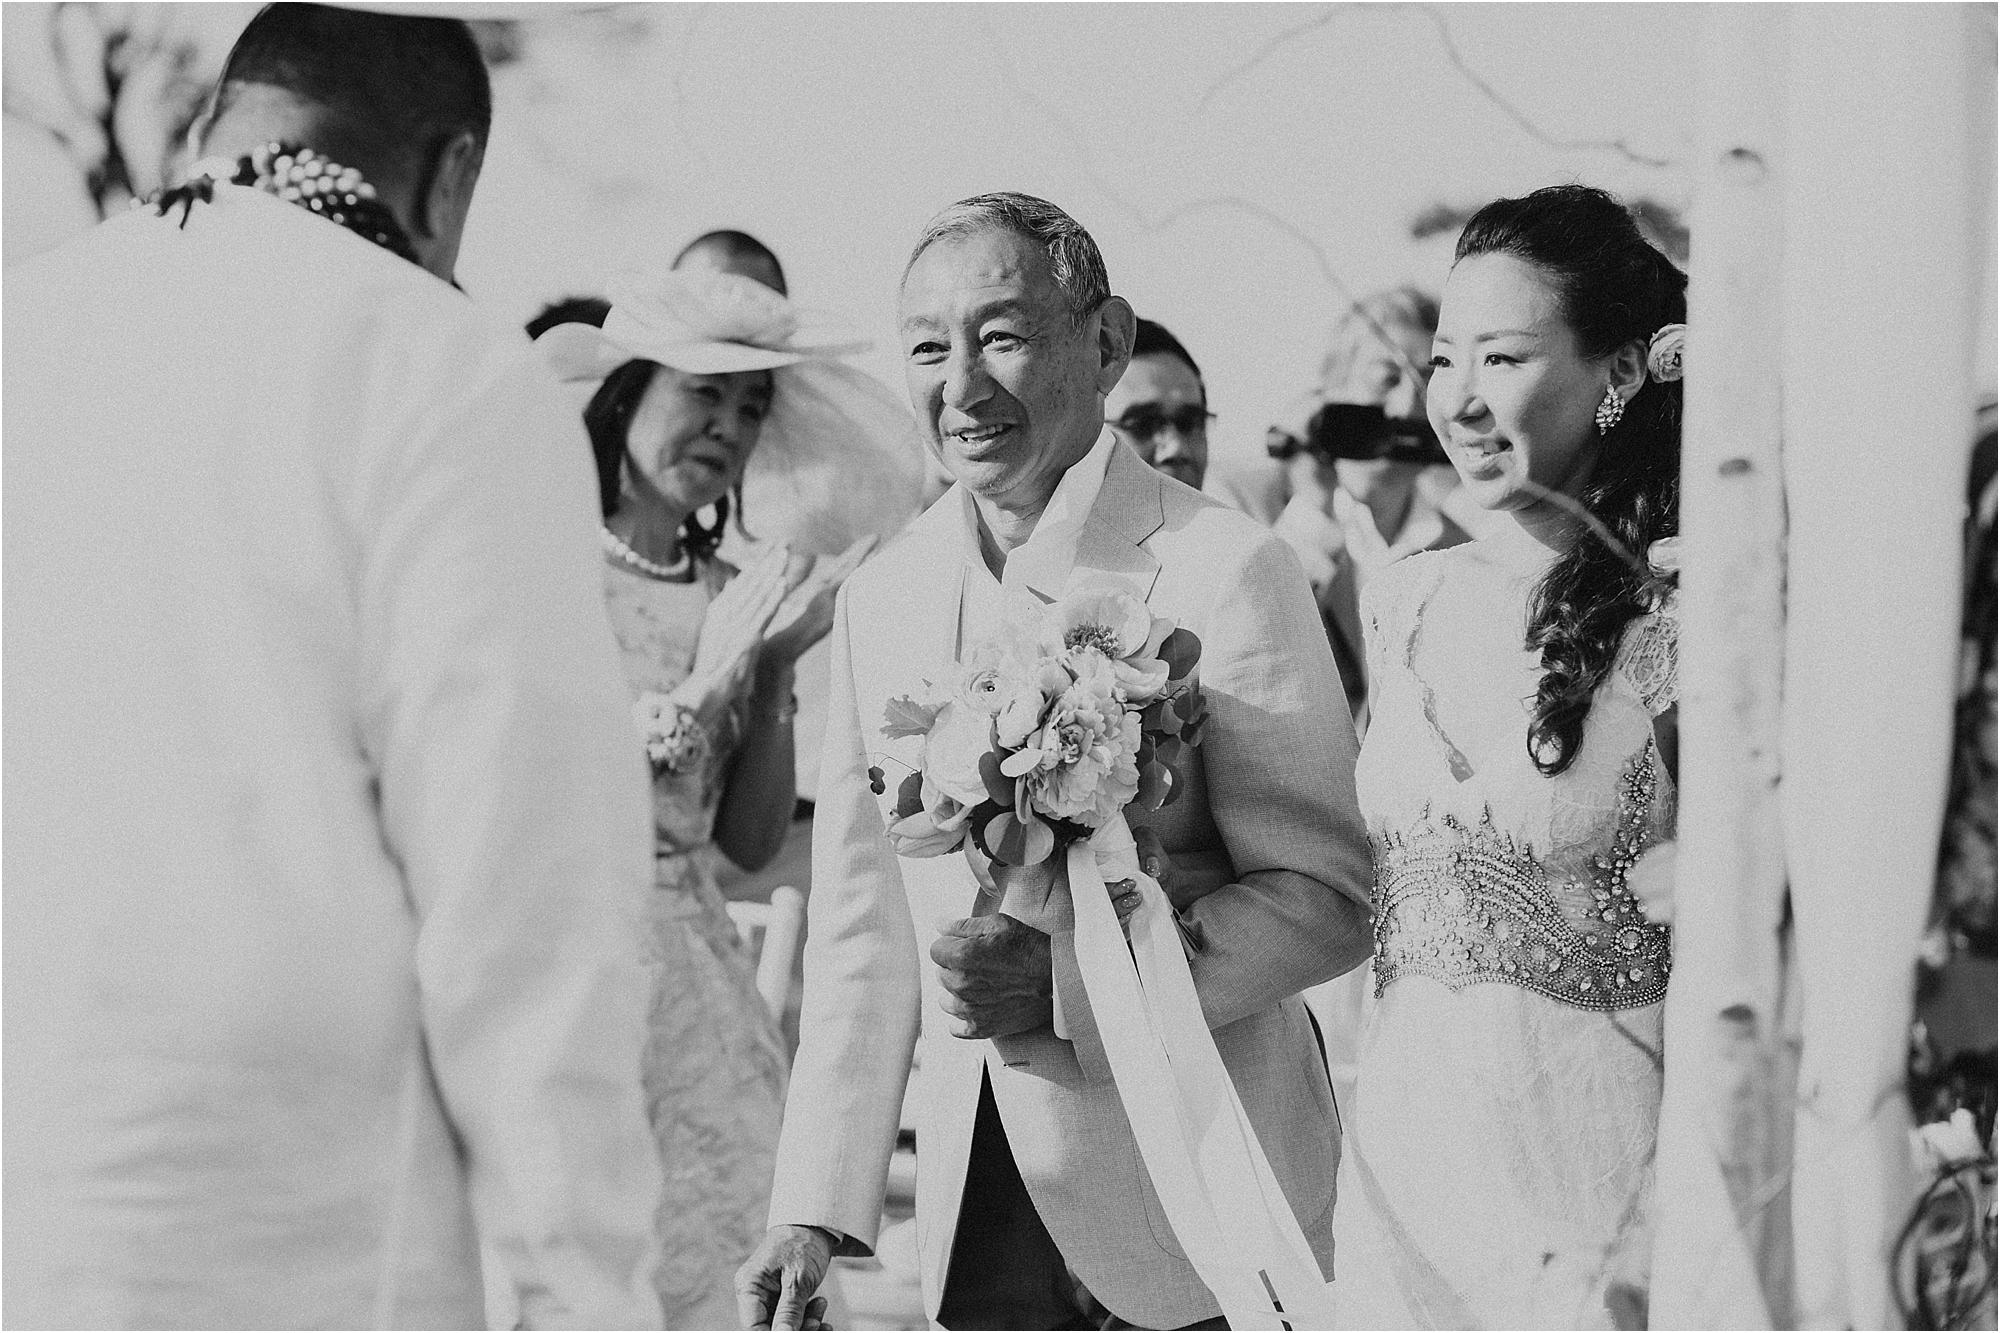 angie-diaz-photography-maui-hawaii-destination-wedding-makena-golf-beach-club_0022.jpg